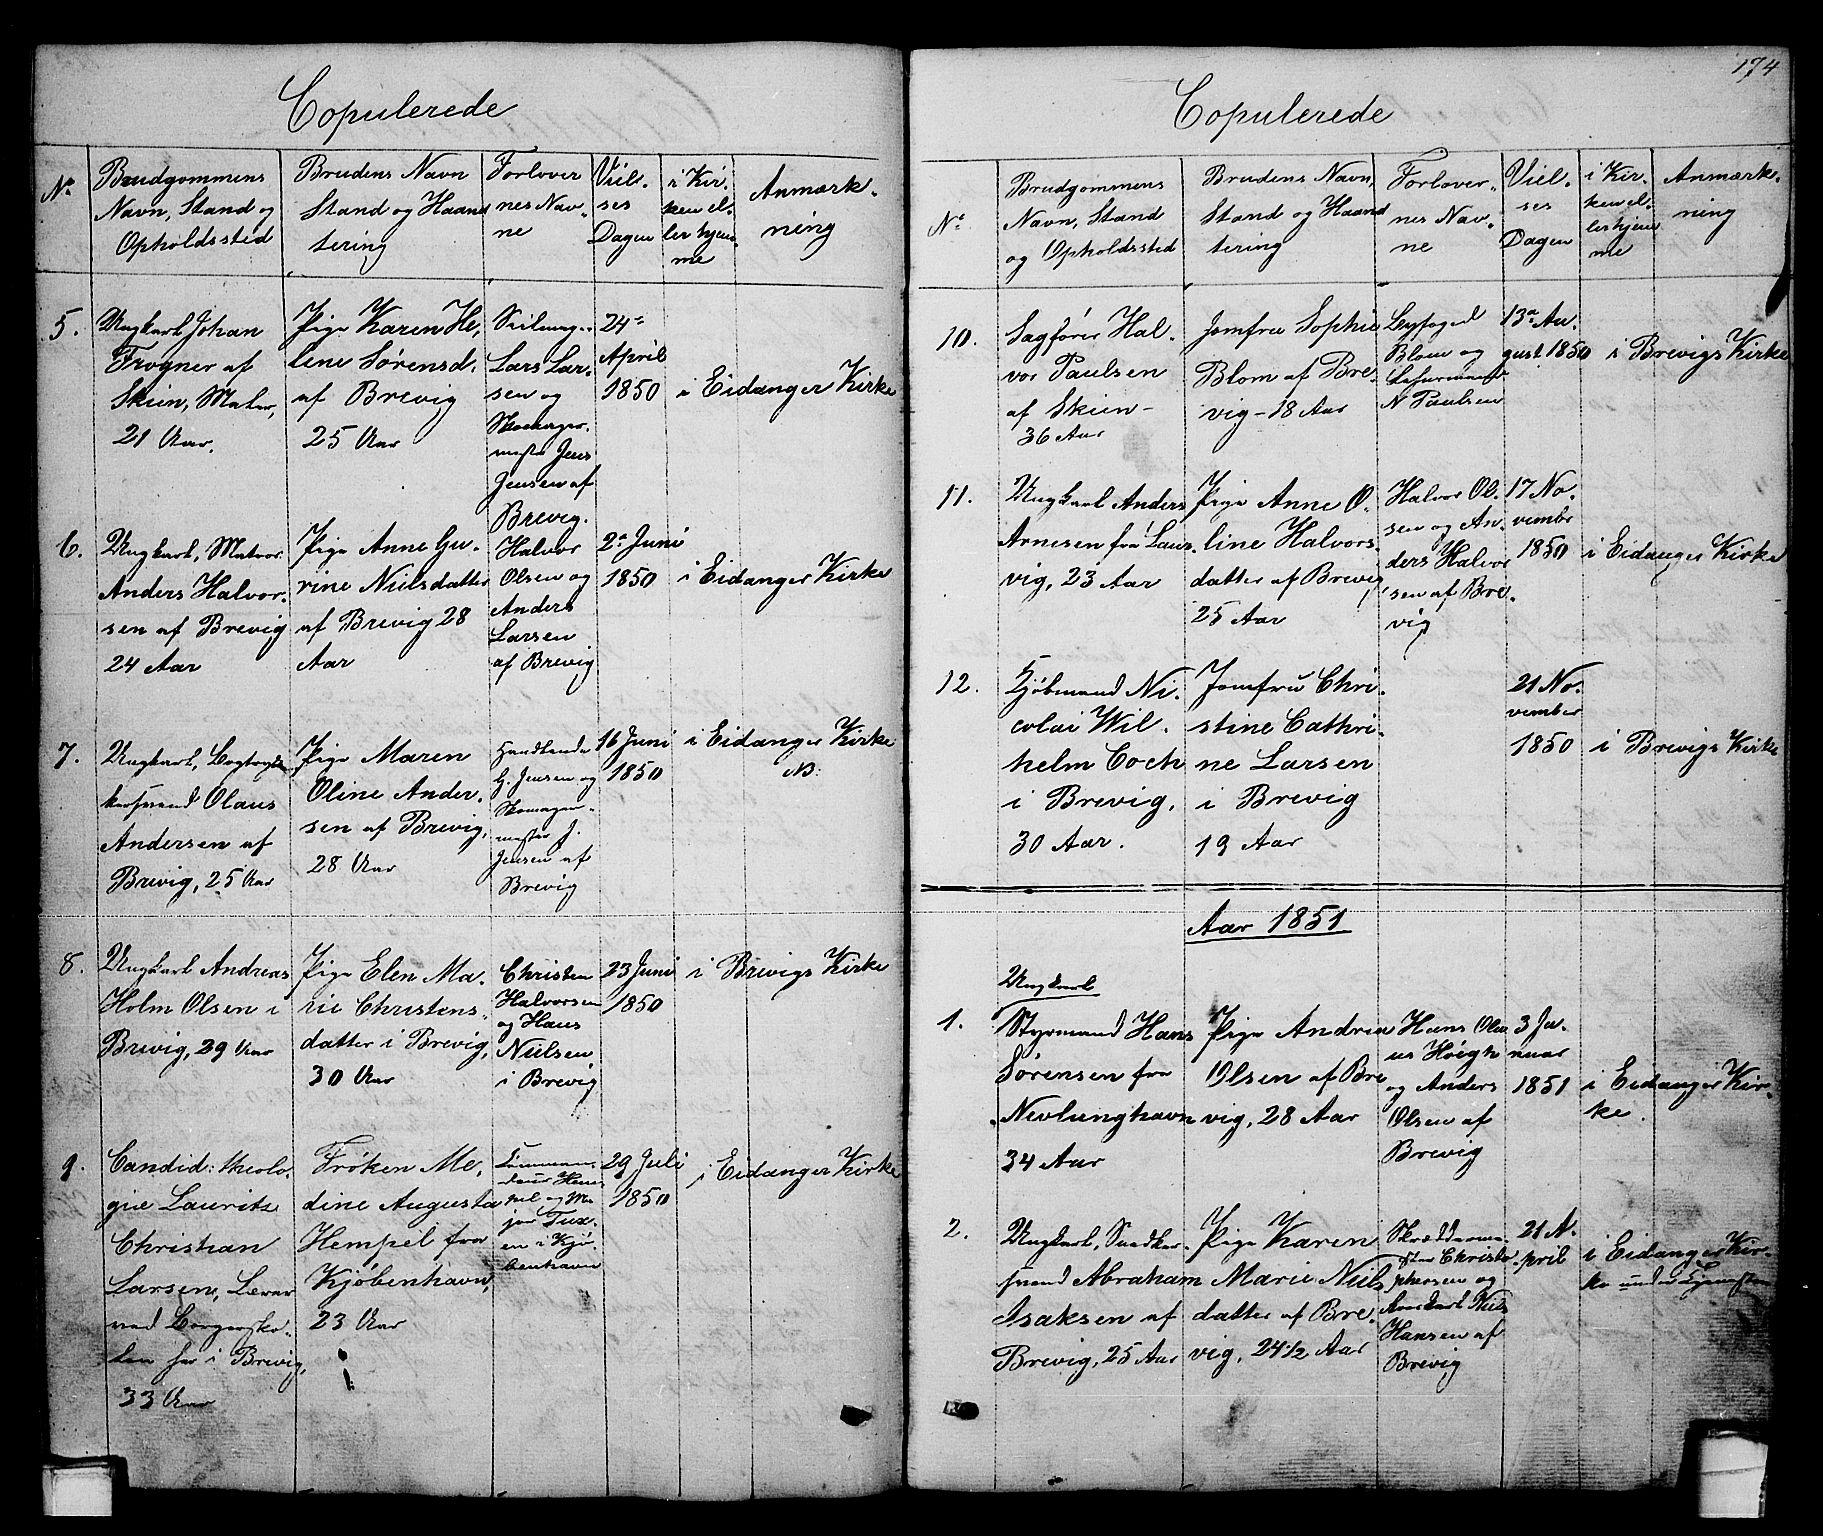 SAKO, Brevik kirkebøker, G/Ga/L0002: Klokkerbok nr. 2, 1846-1865, s. 174